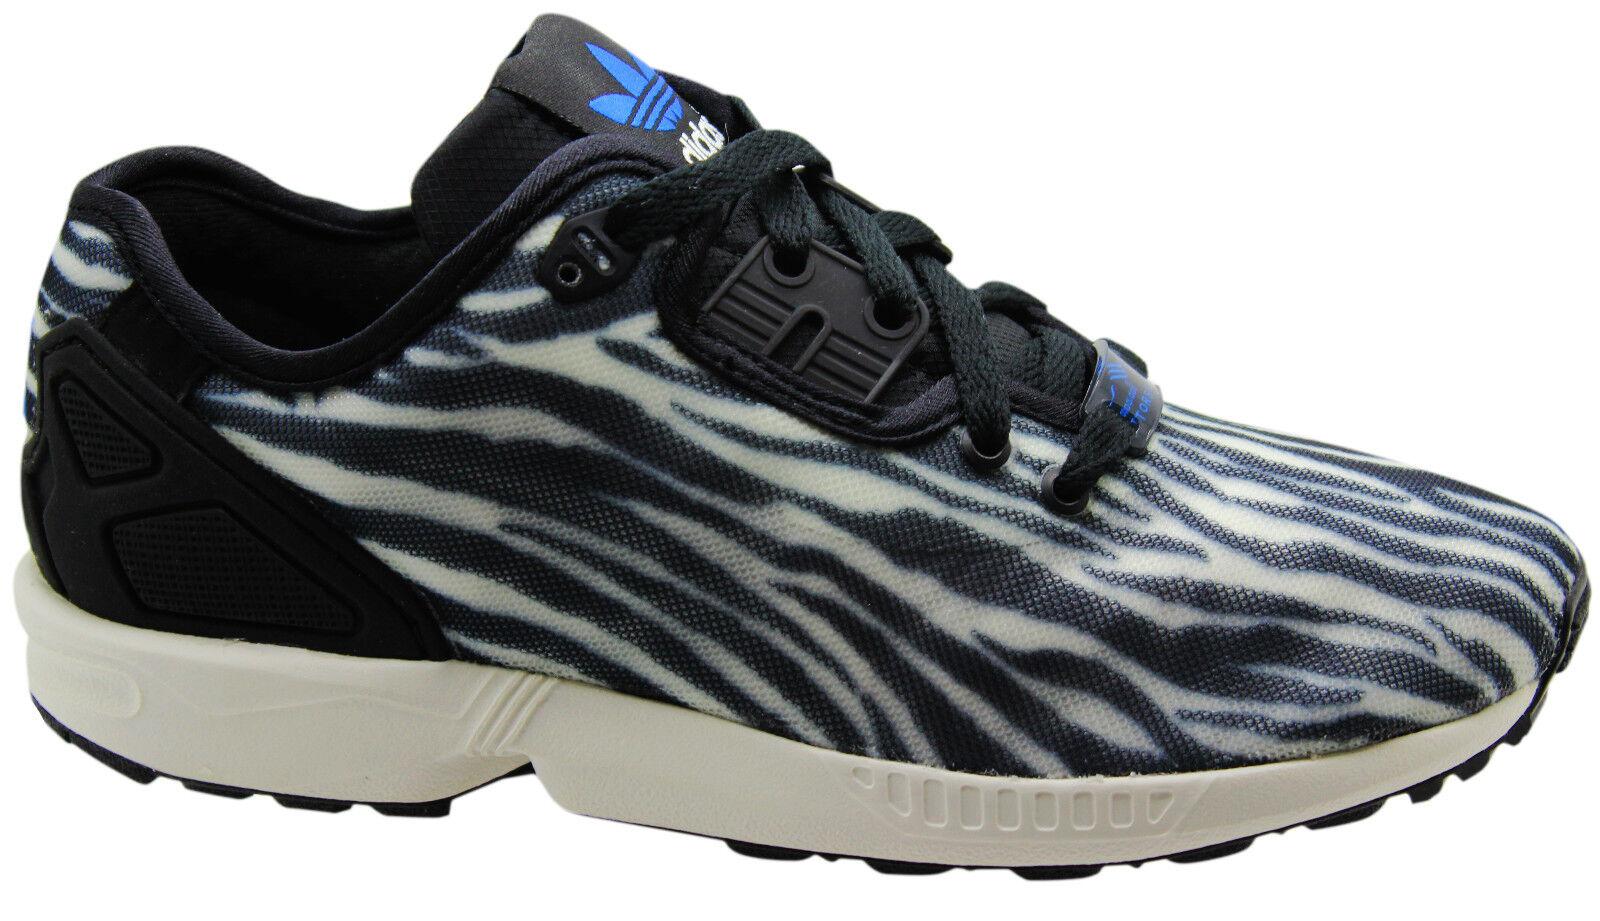 Adidas originali zx flusso decontaminazione mens formatori scarpe neri b23728 u55 | Folle Prezzo  | Sig/Sig Ra Scarpa